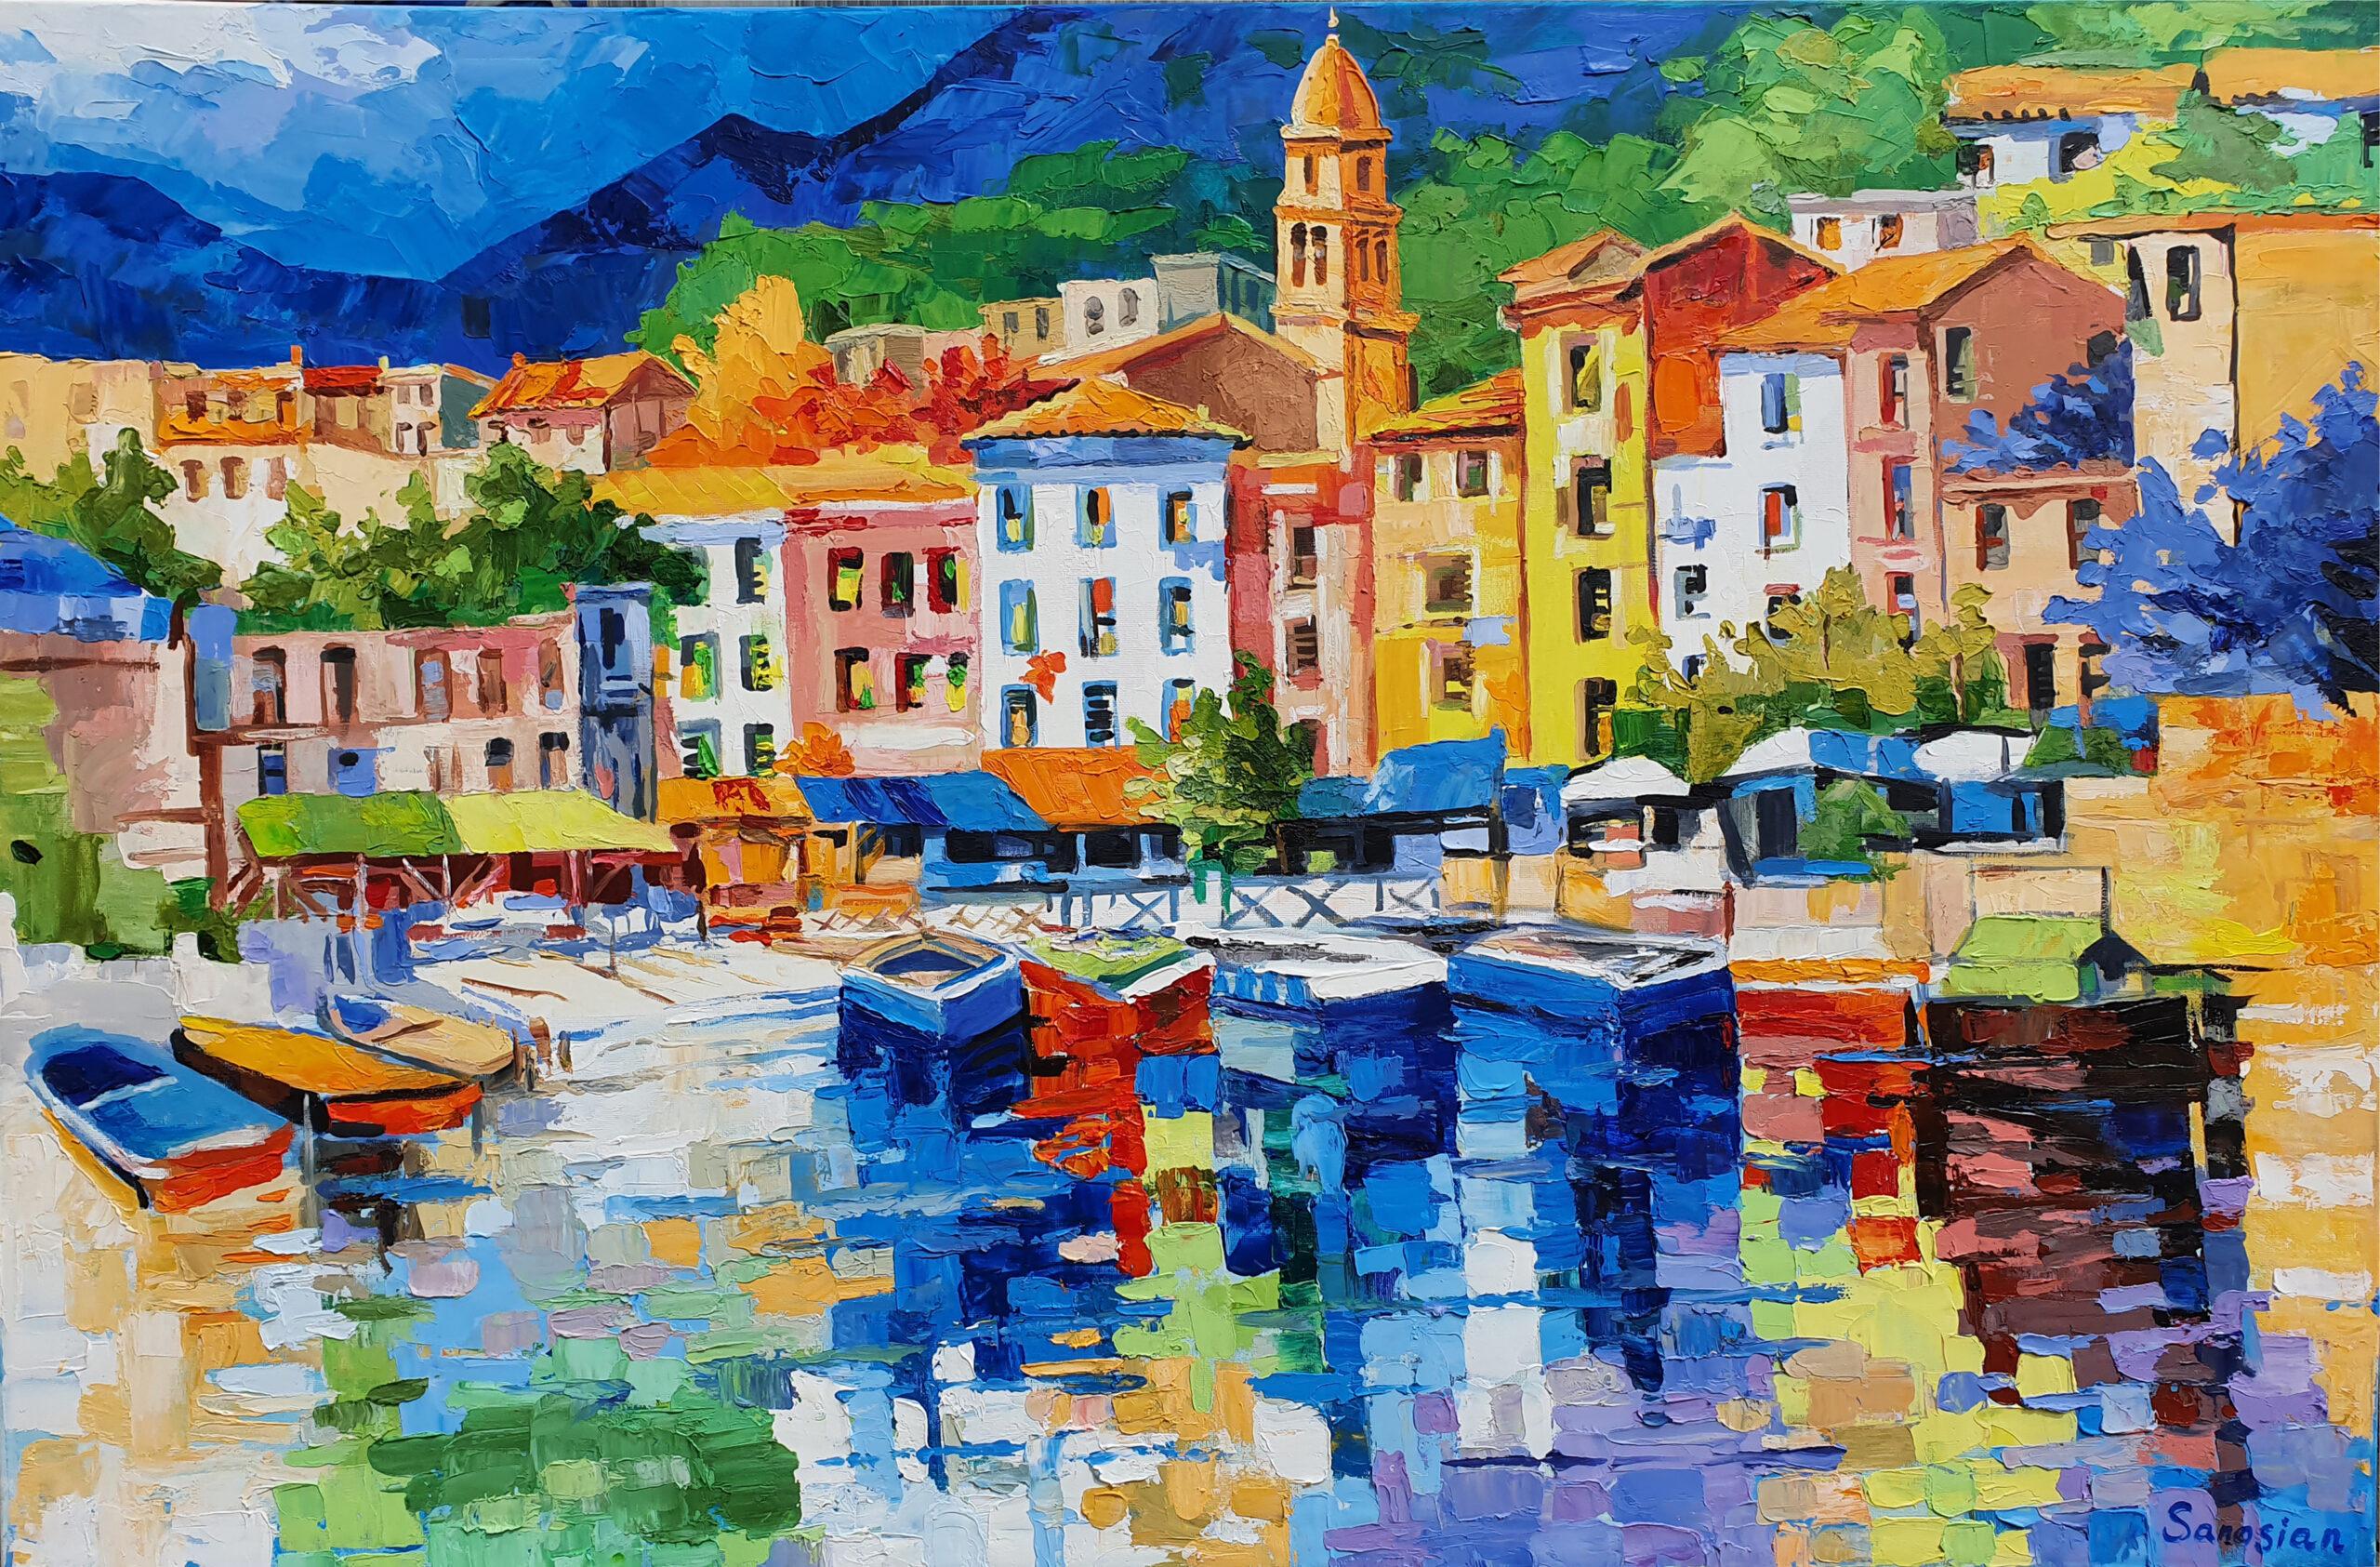 Toscaans havenstadje Arthur Sanosian